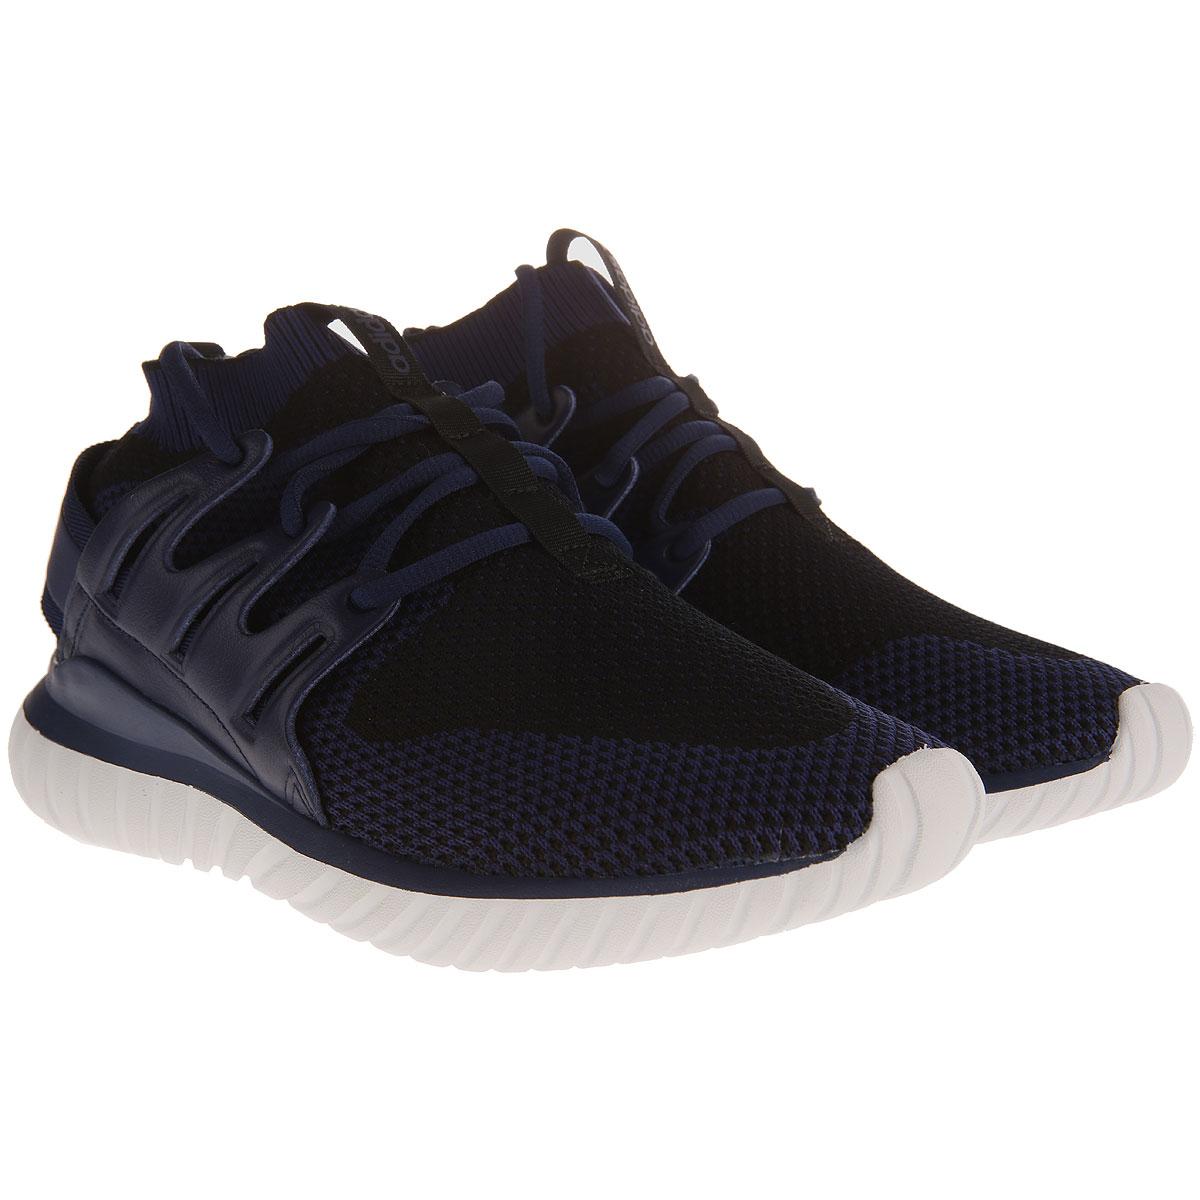 Image of Adidas Mens Shoes On Sale in Outlet, Tubular Nova, Blue, Knitted, 2017, US 8 1/2 - UK 8 - EU 42 US 10 - UK 9 1/2 - EU 44